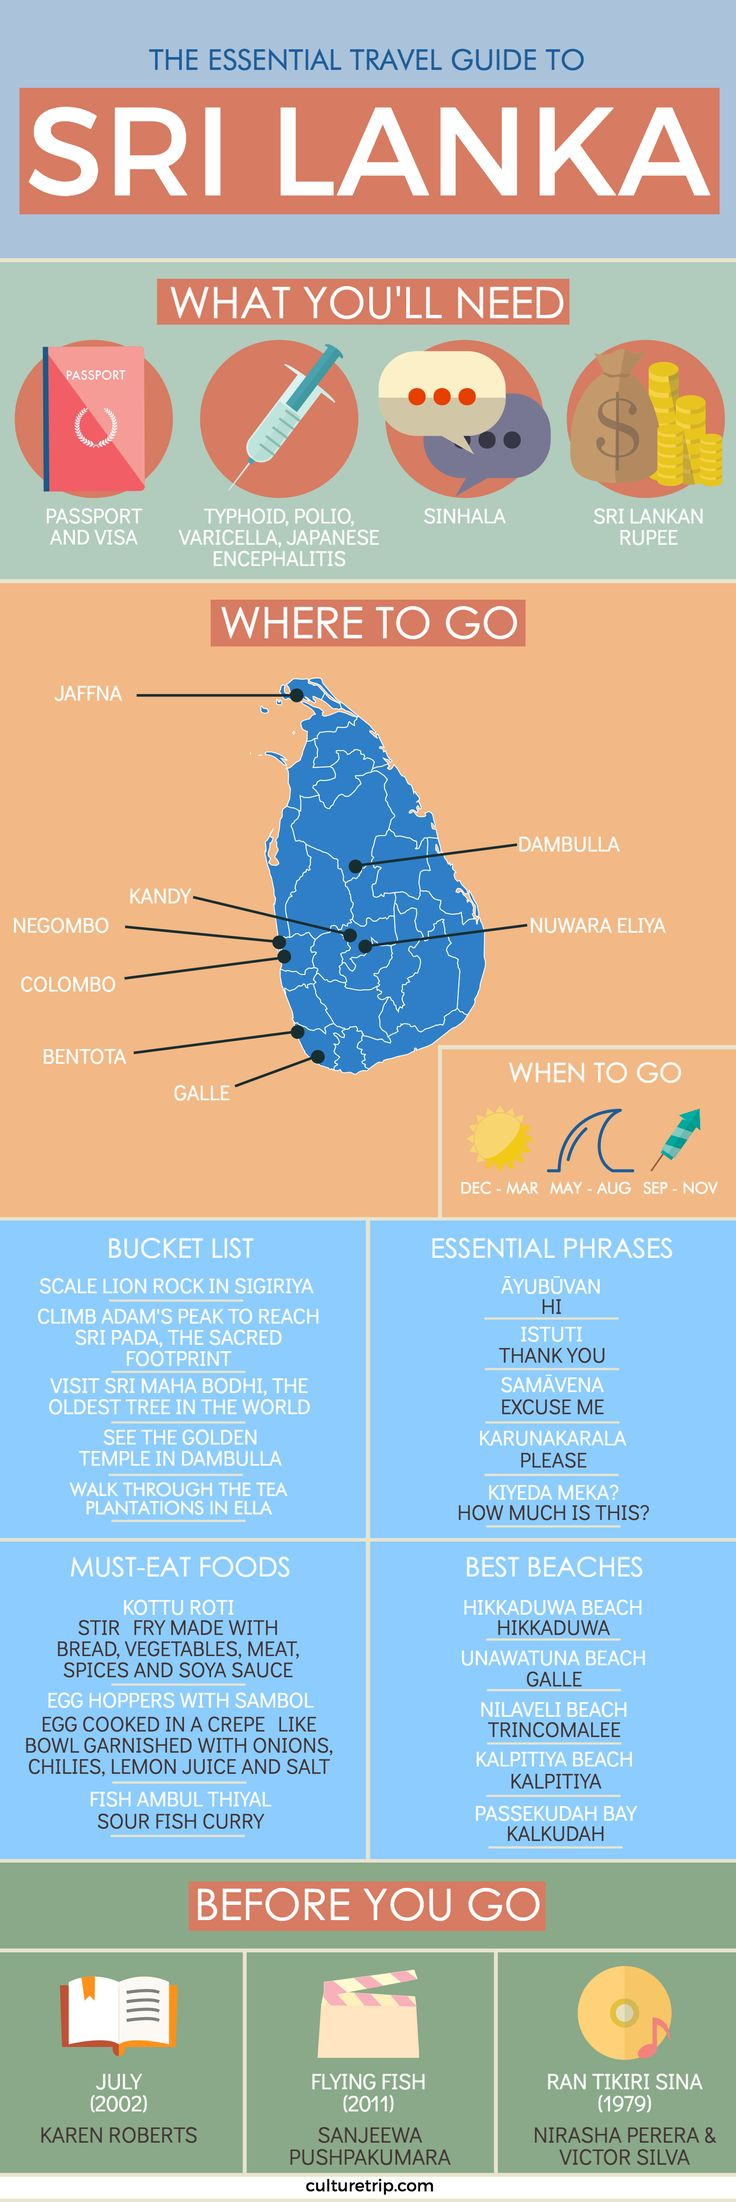 The Ultimate Guide To Sri Lanka